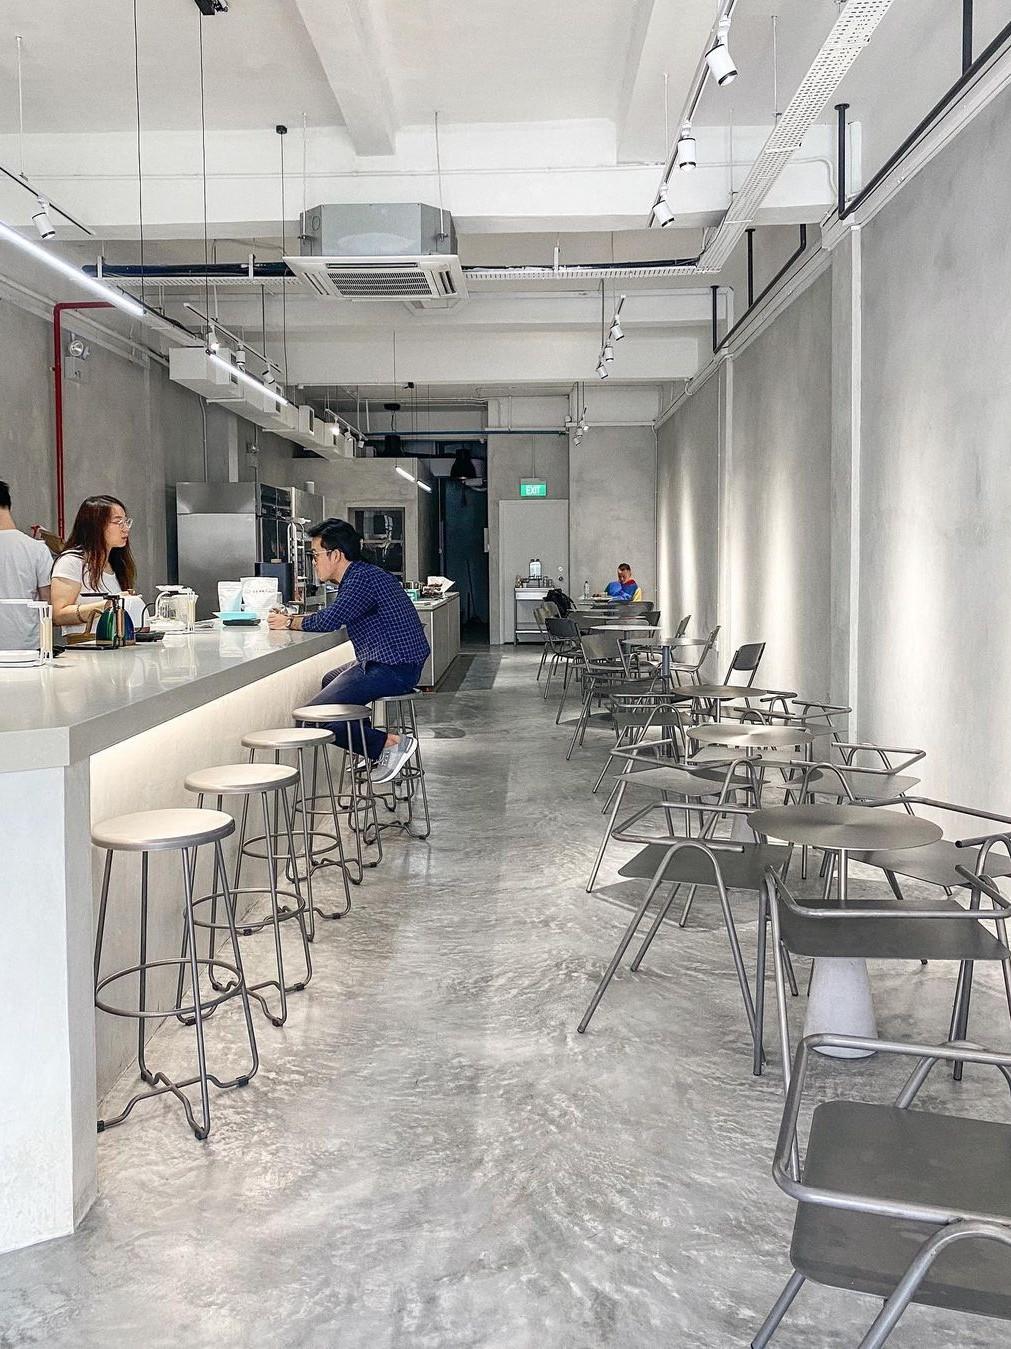 Lucid Restaurants, Cafés in Singapore